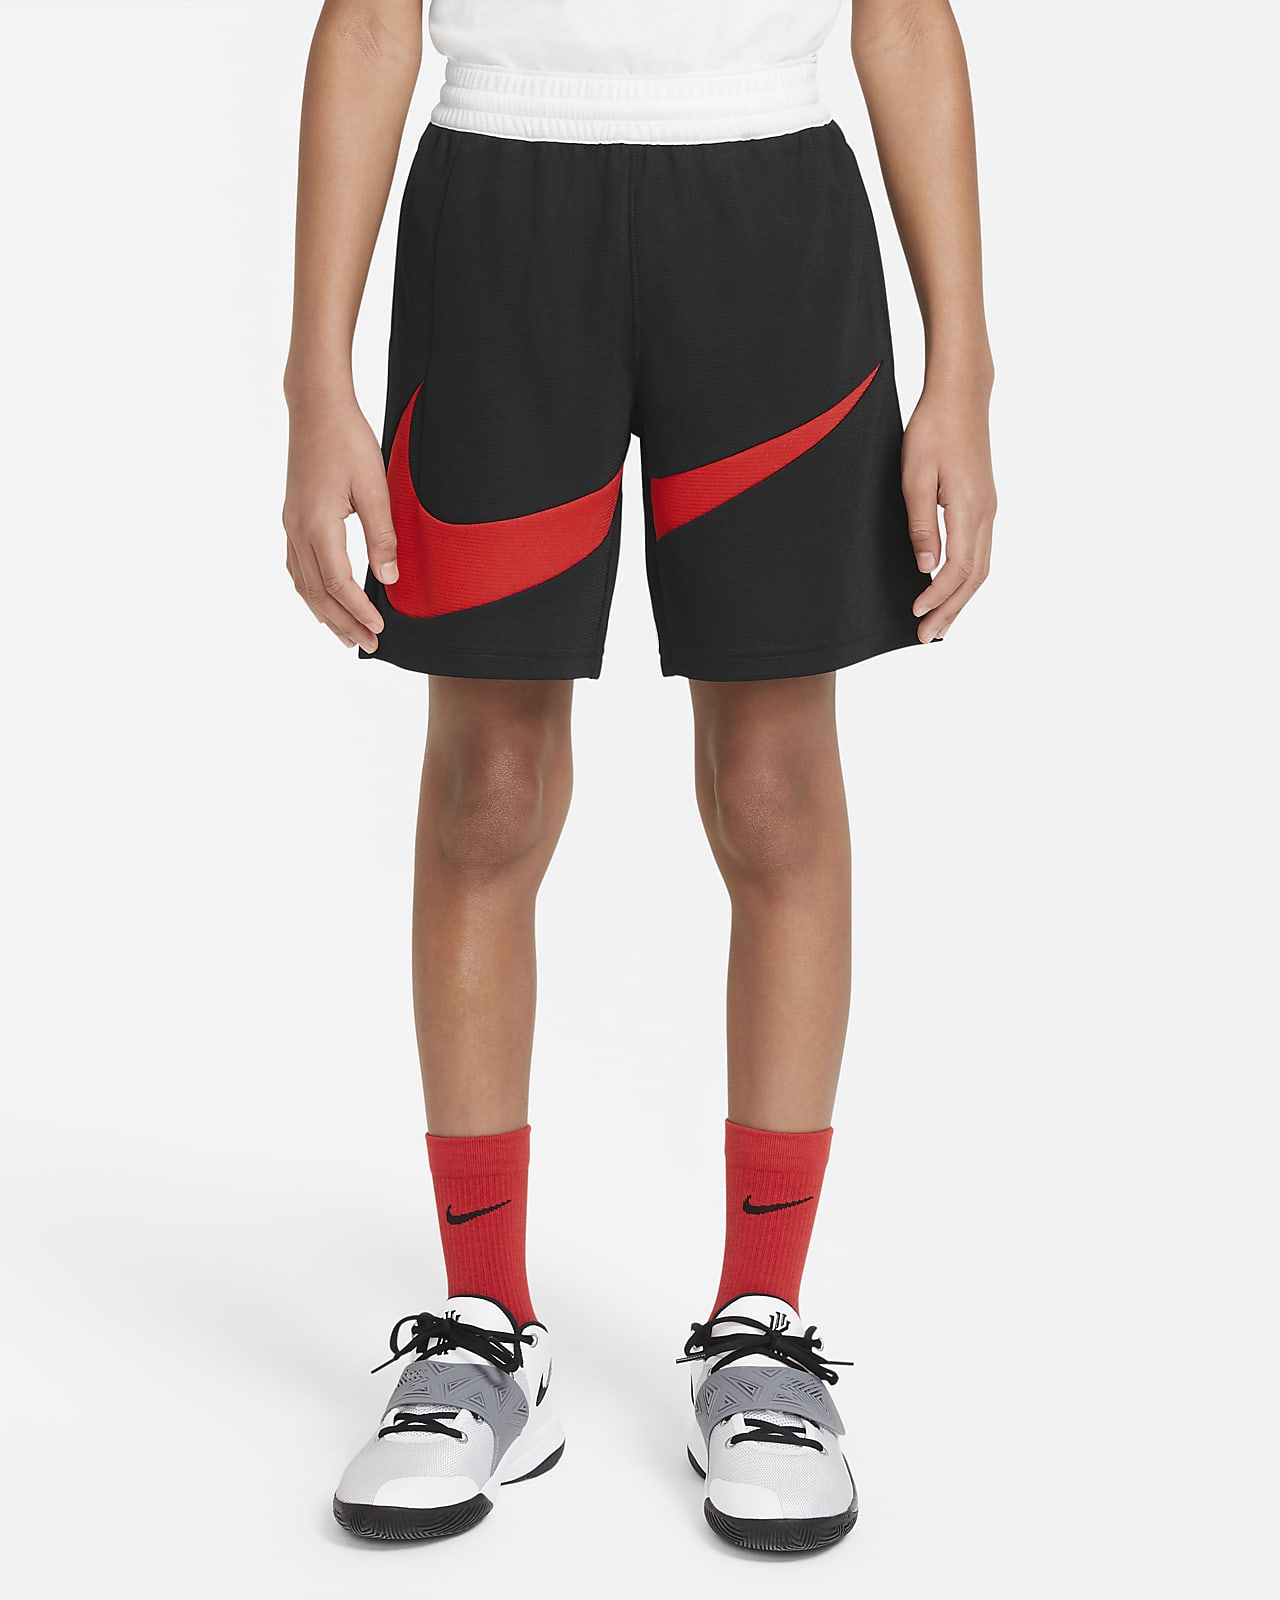 Nike Dri-FIT-basketballshorts til store børn (drenge)